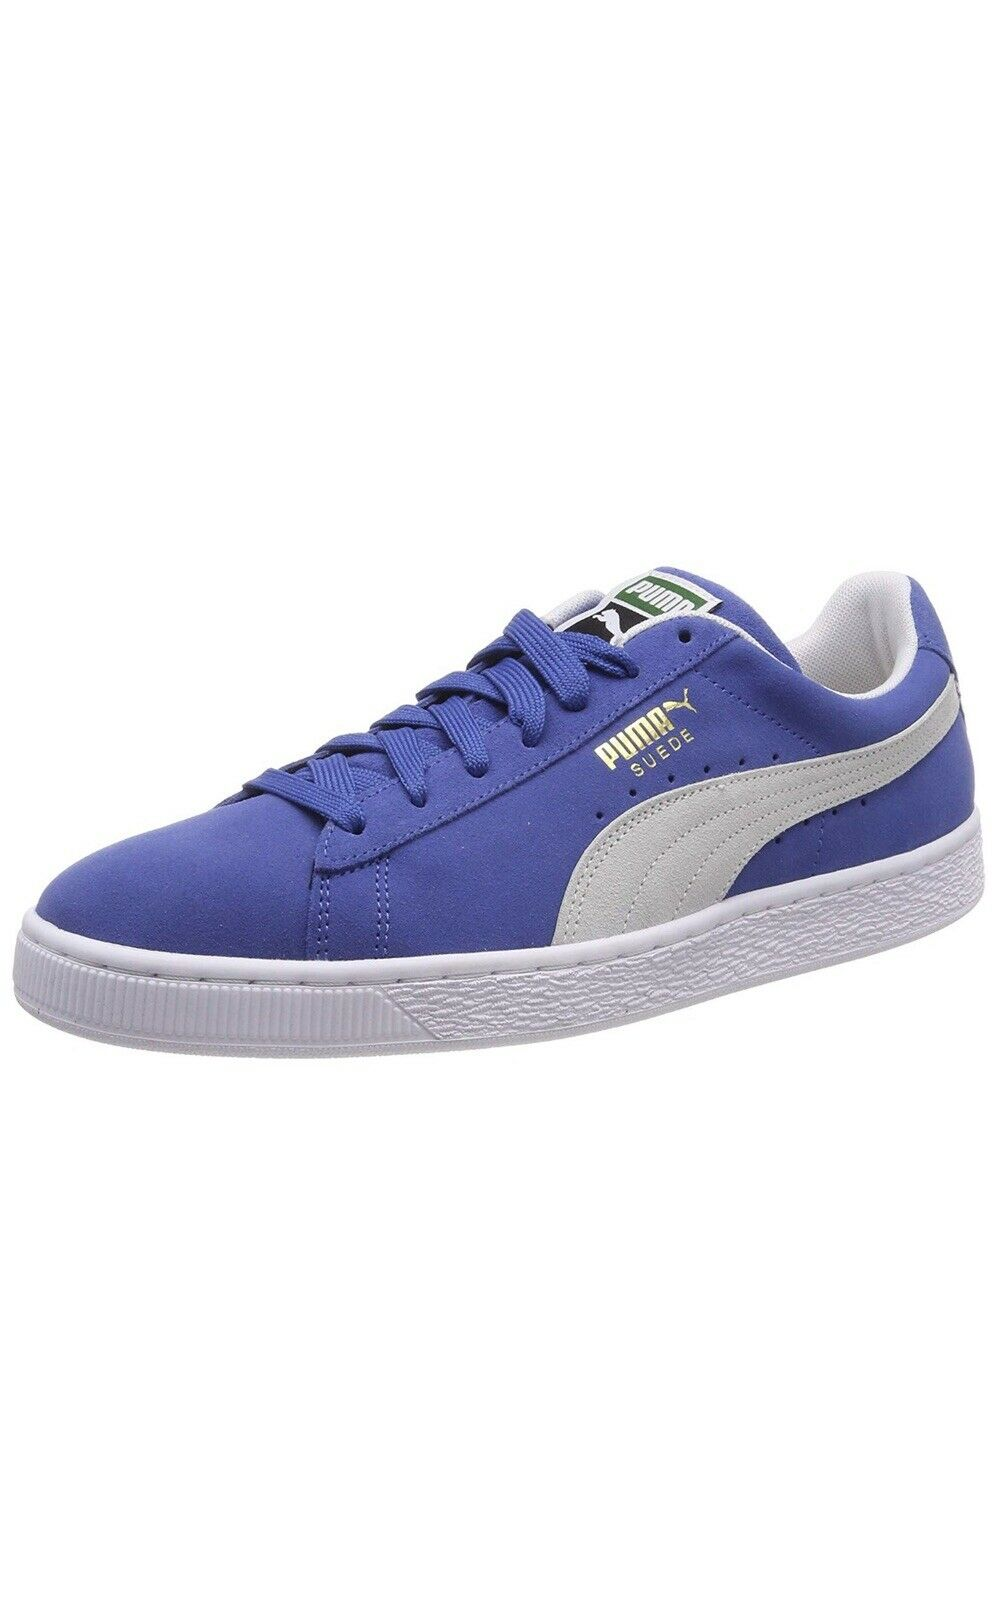 info for 78534 71a2d New Puma Suede + Men s shoes Size 9.5 Classic Athletic nohgxm2194-Men s  Athletic Shoes